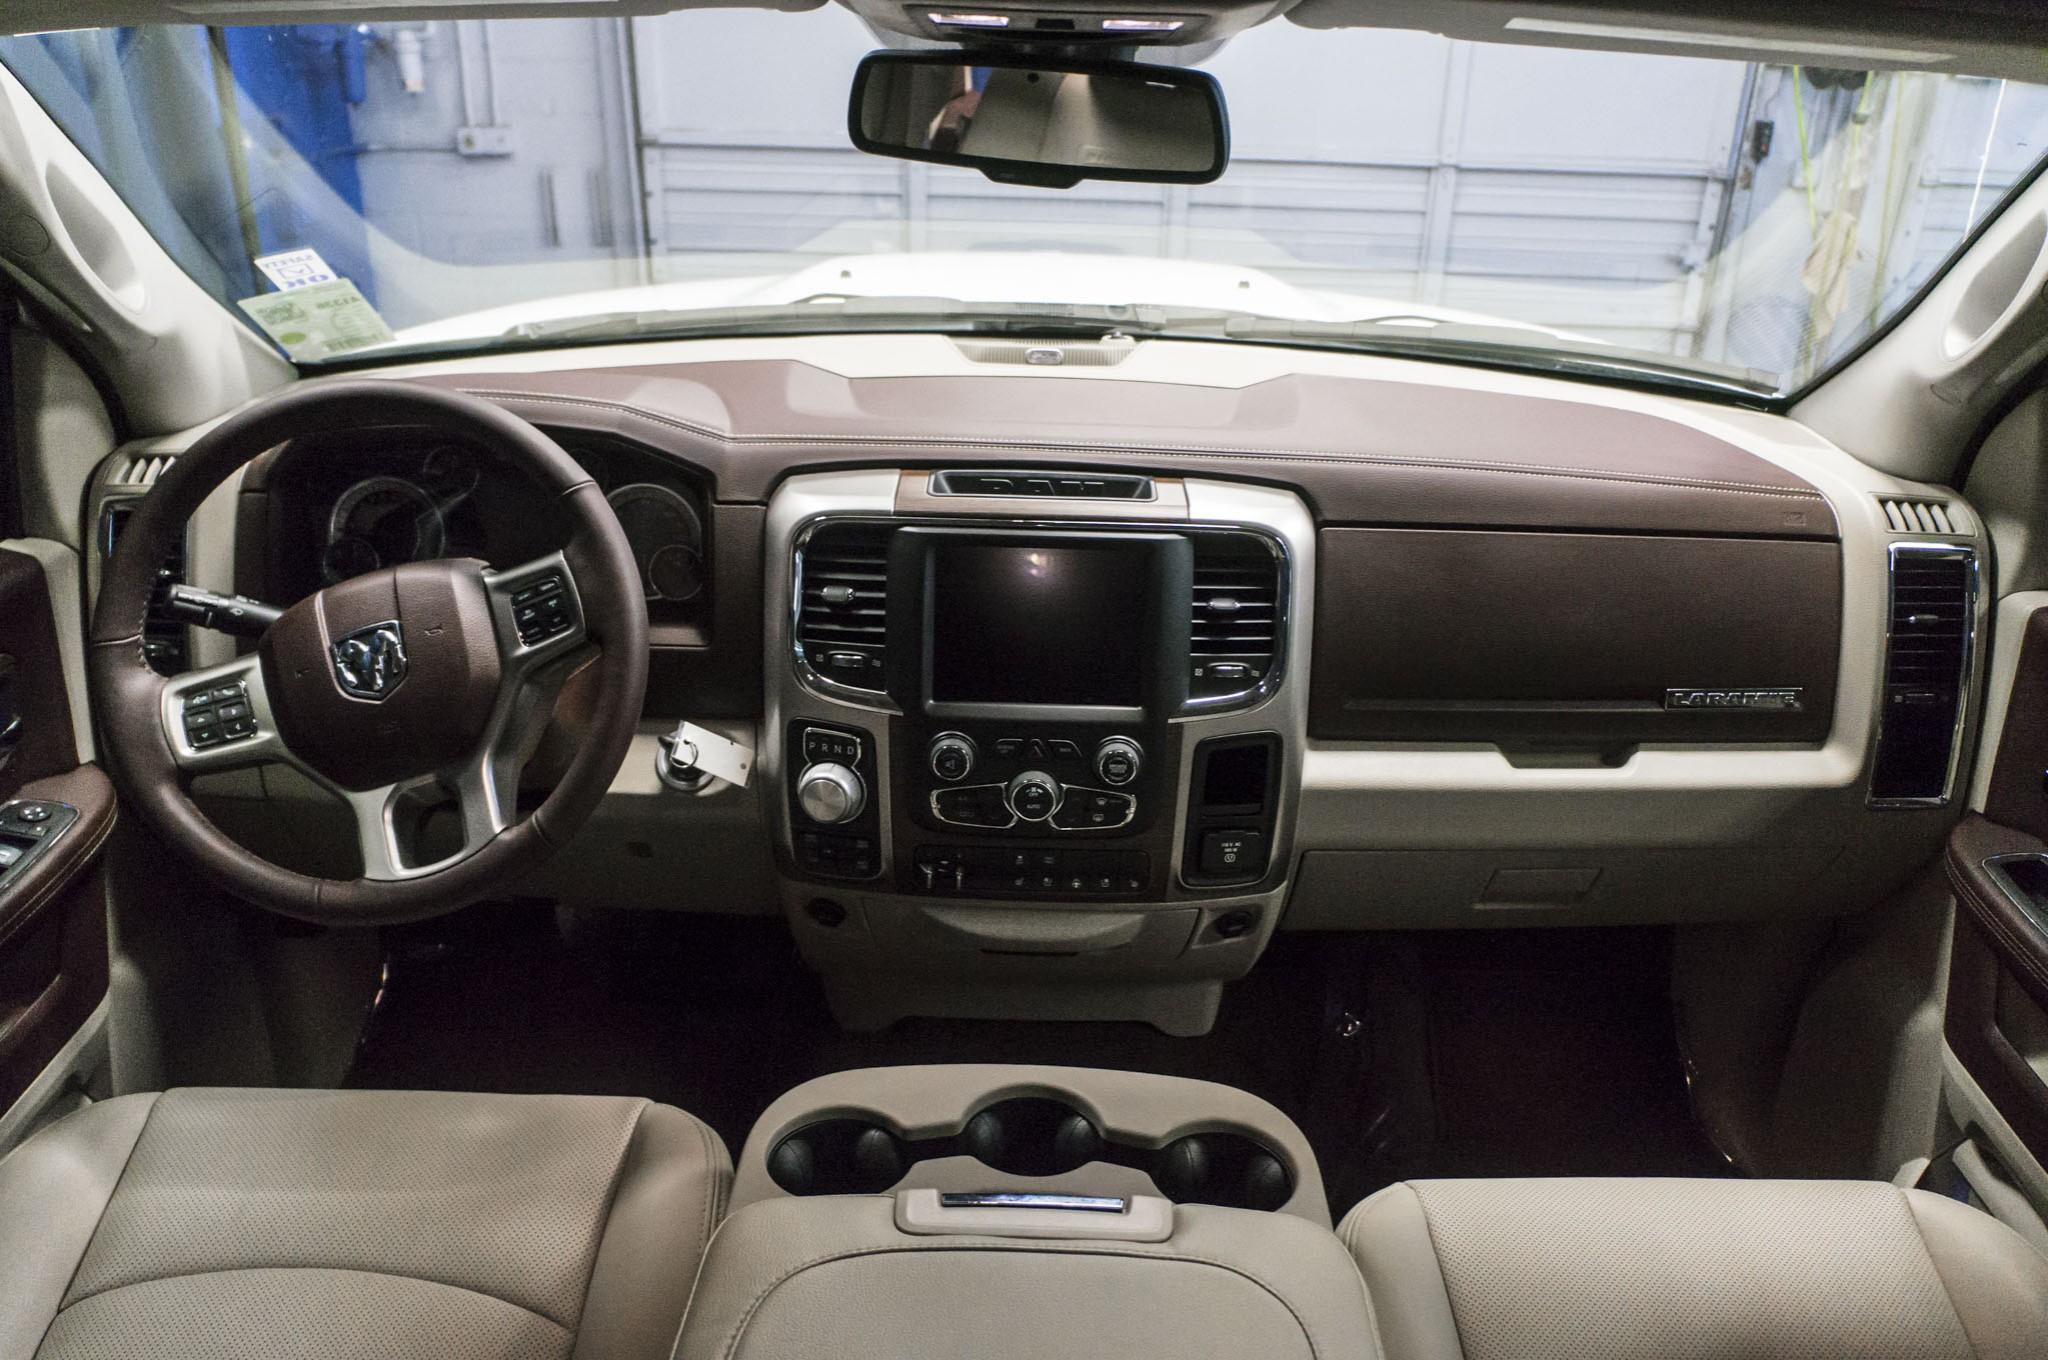 2017 Dodge Ram 1500 Diesel On Dodge Cruise Control